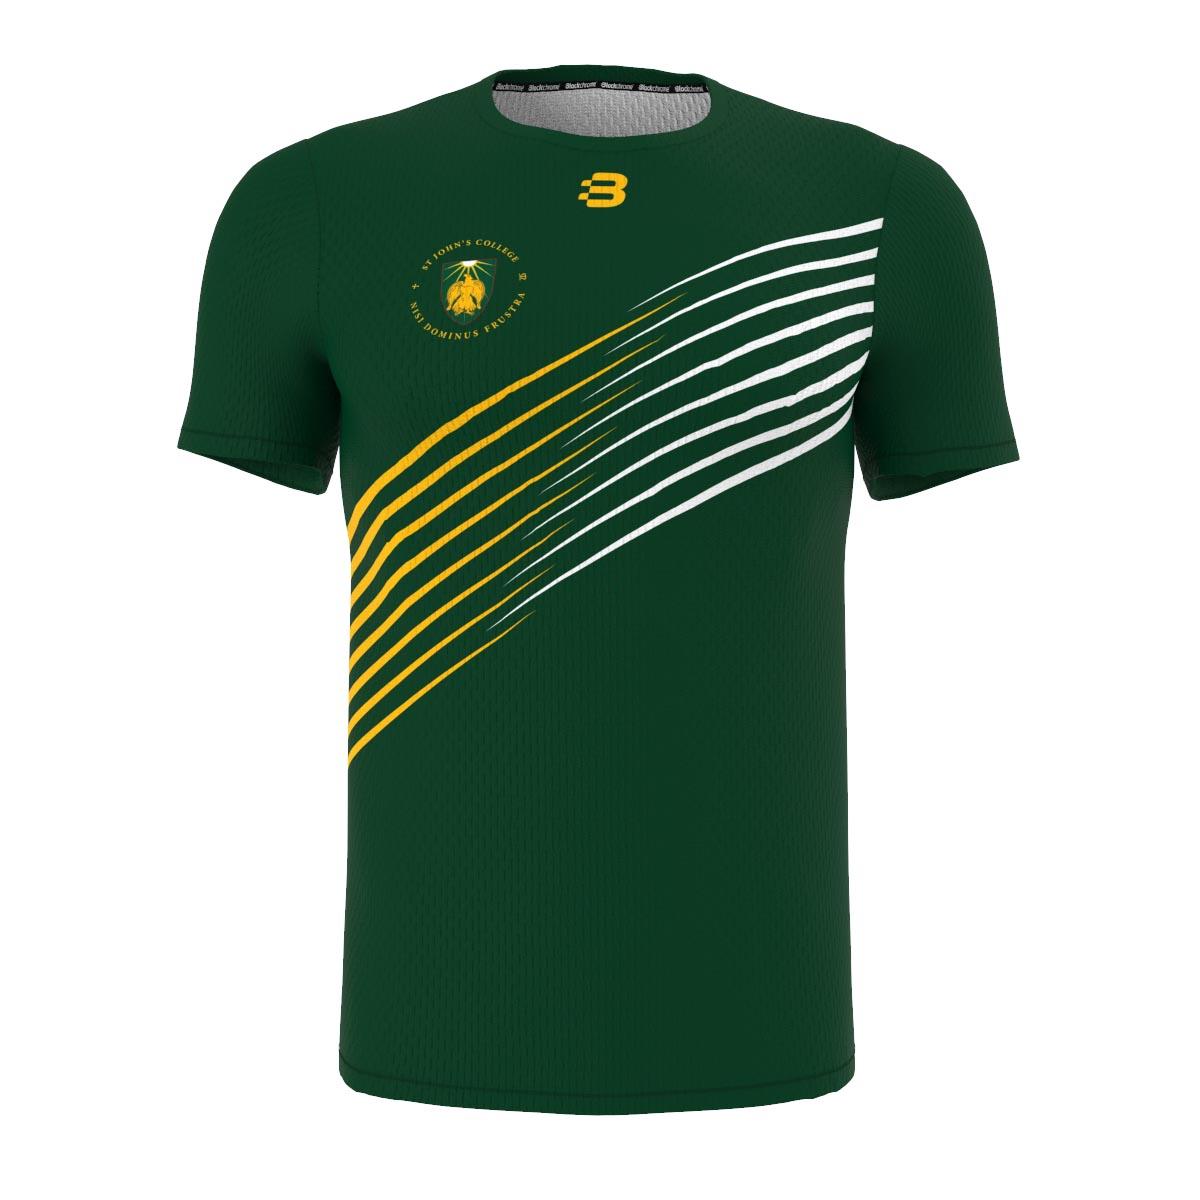 Custom Swimming Apparel - St John's Example - T-Shirt - Any Design, Any Colour - Front